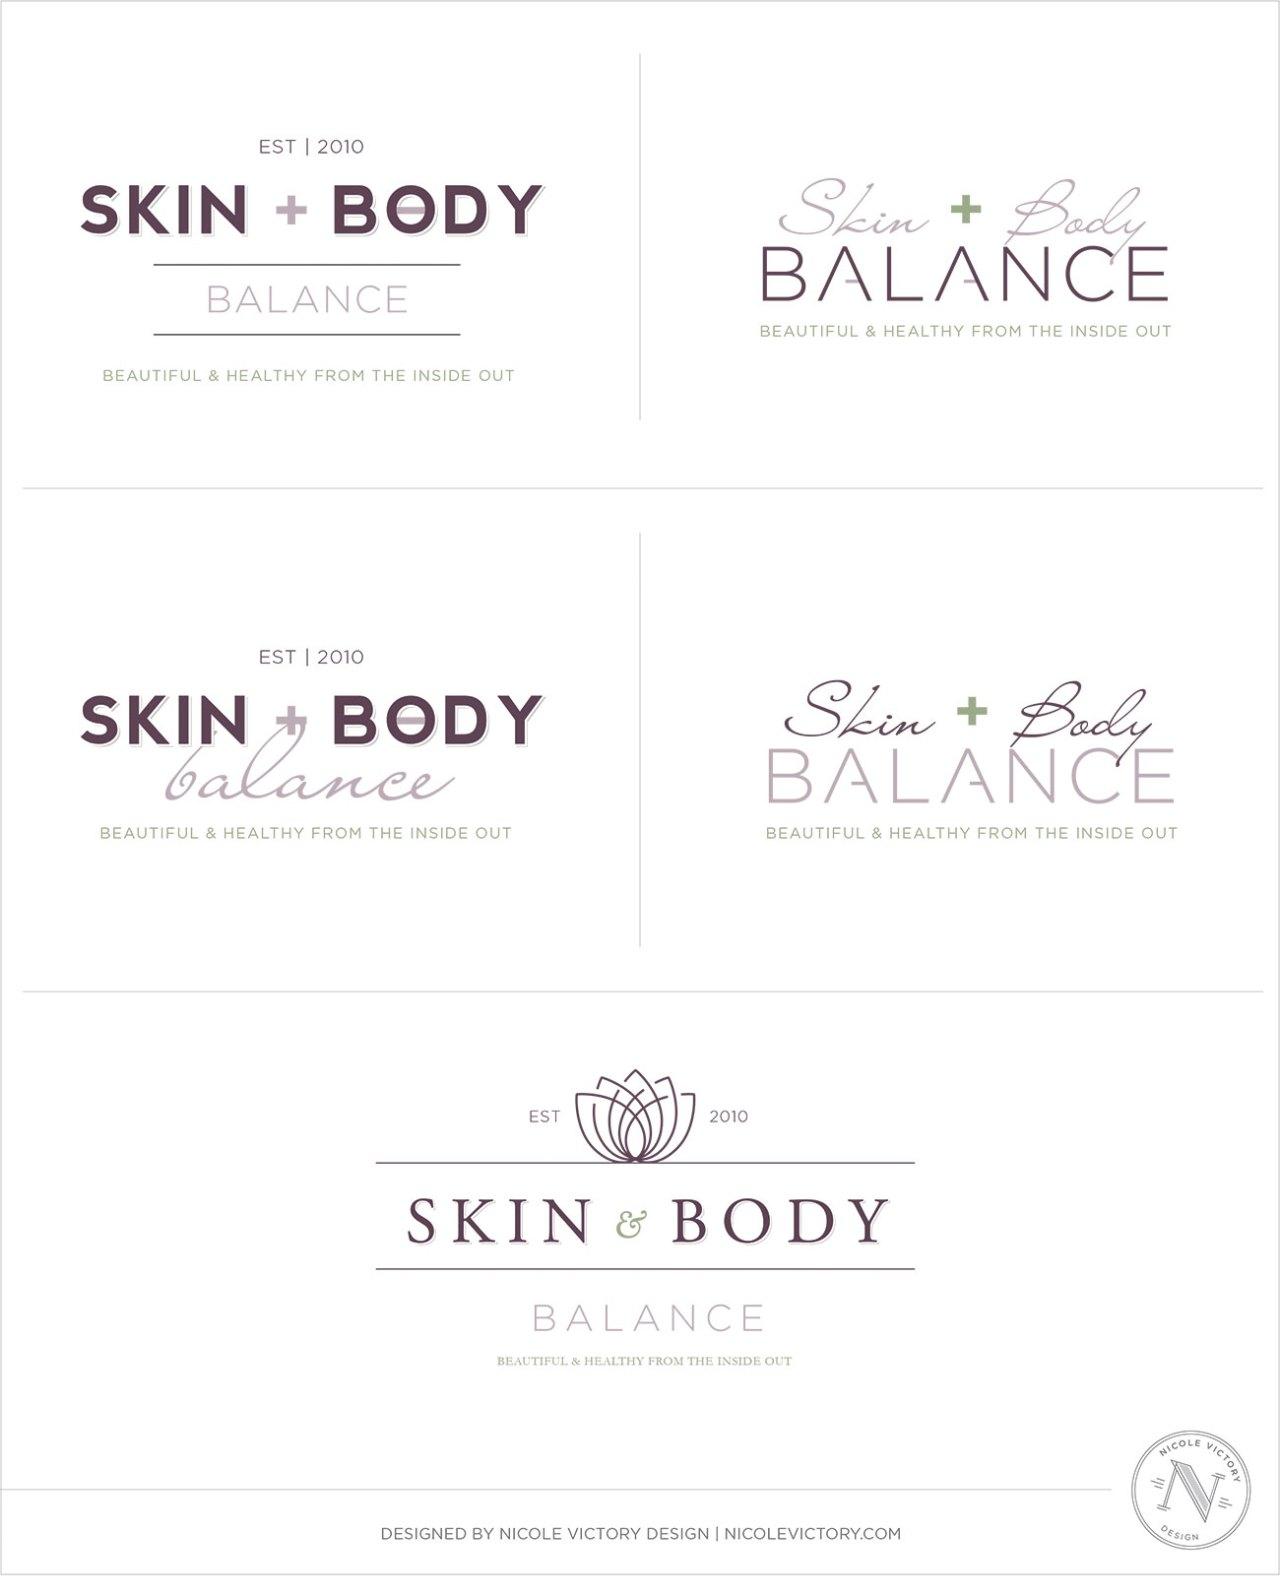 Skin And Body Balance Logo Concepts | Nicole Victory Design